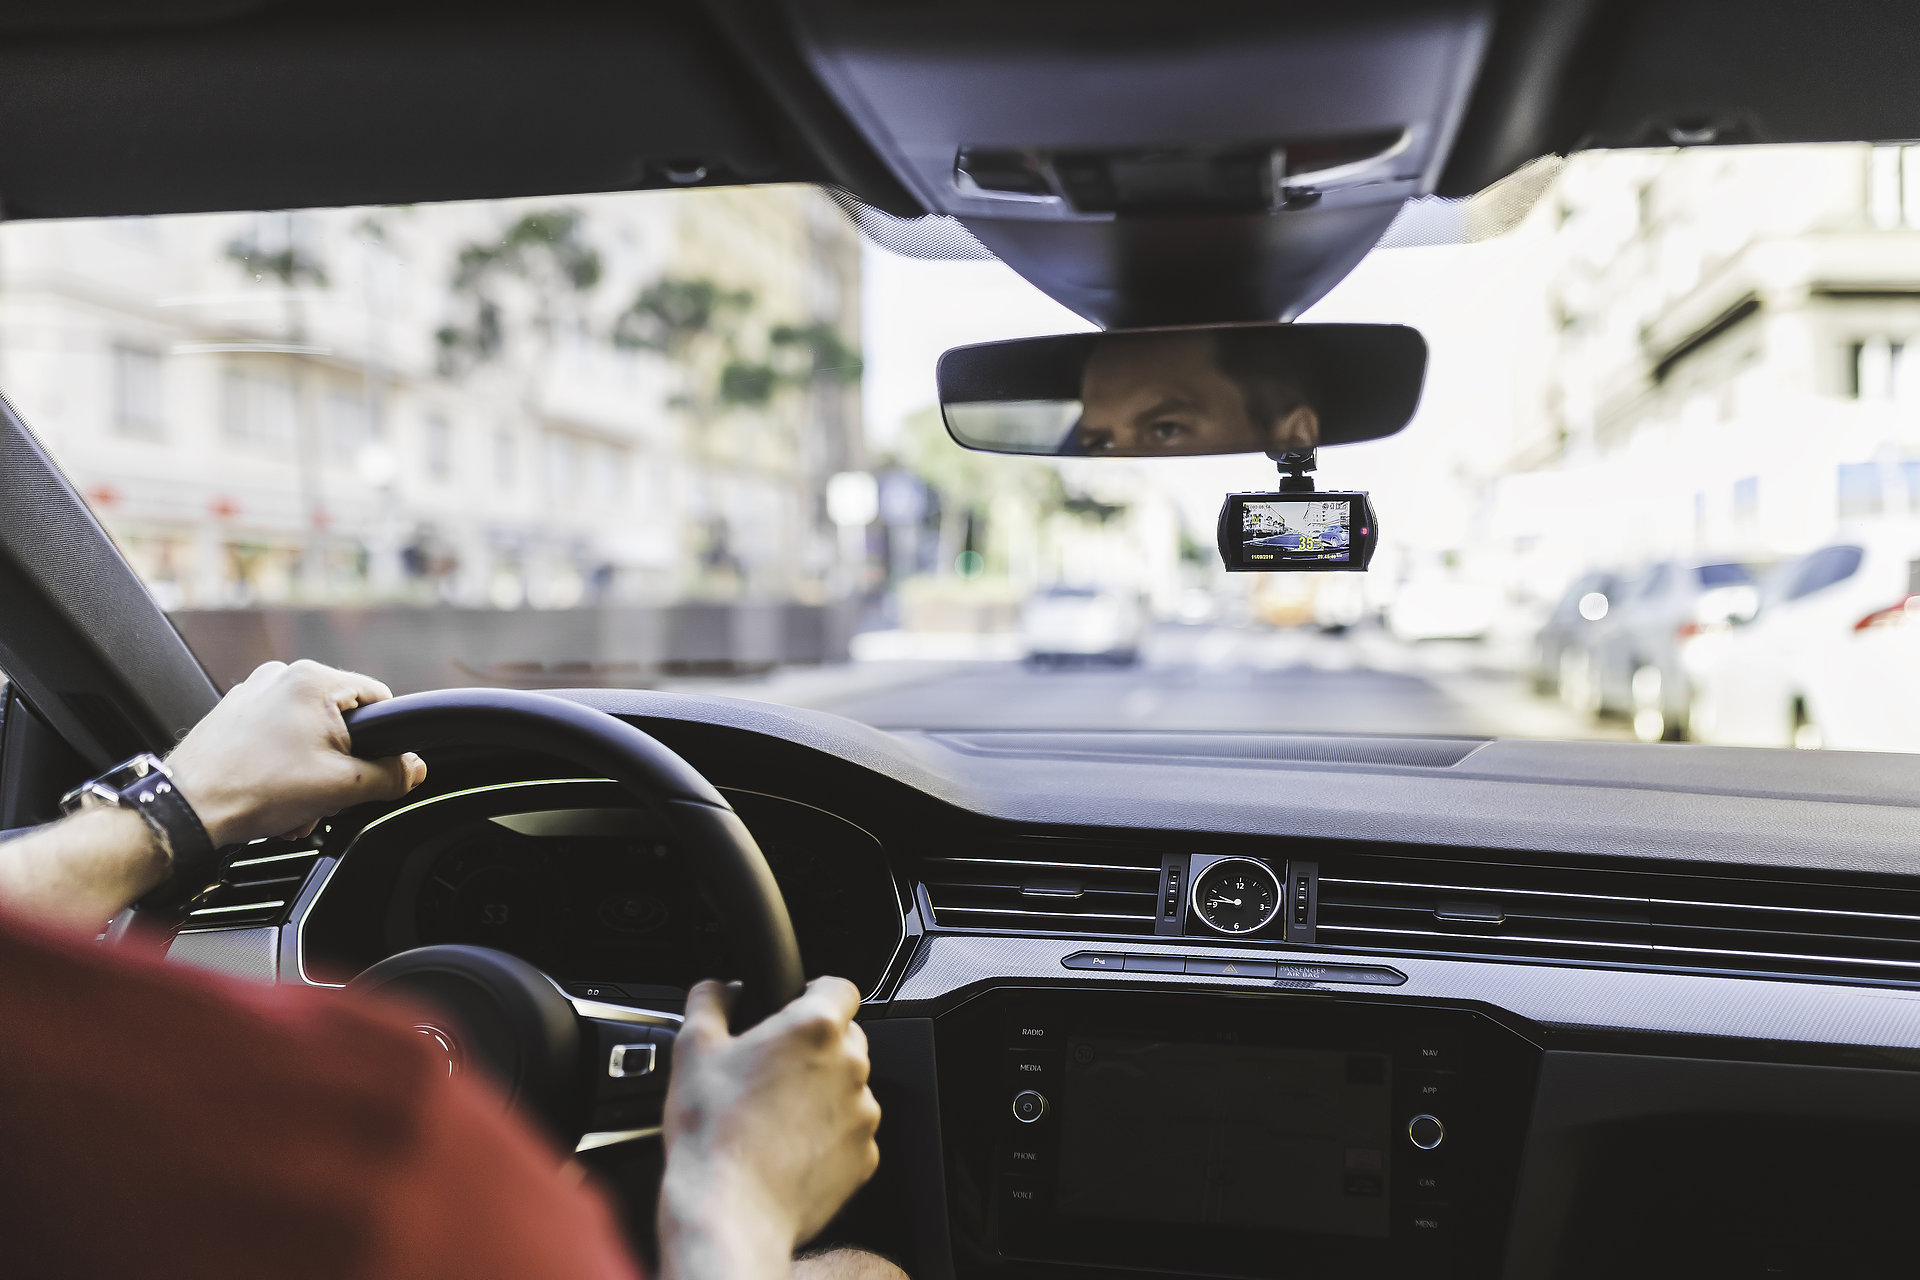 دوربین کوچک خودرو | دوربین مخفی خودرو